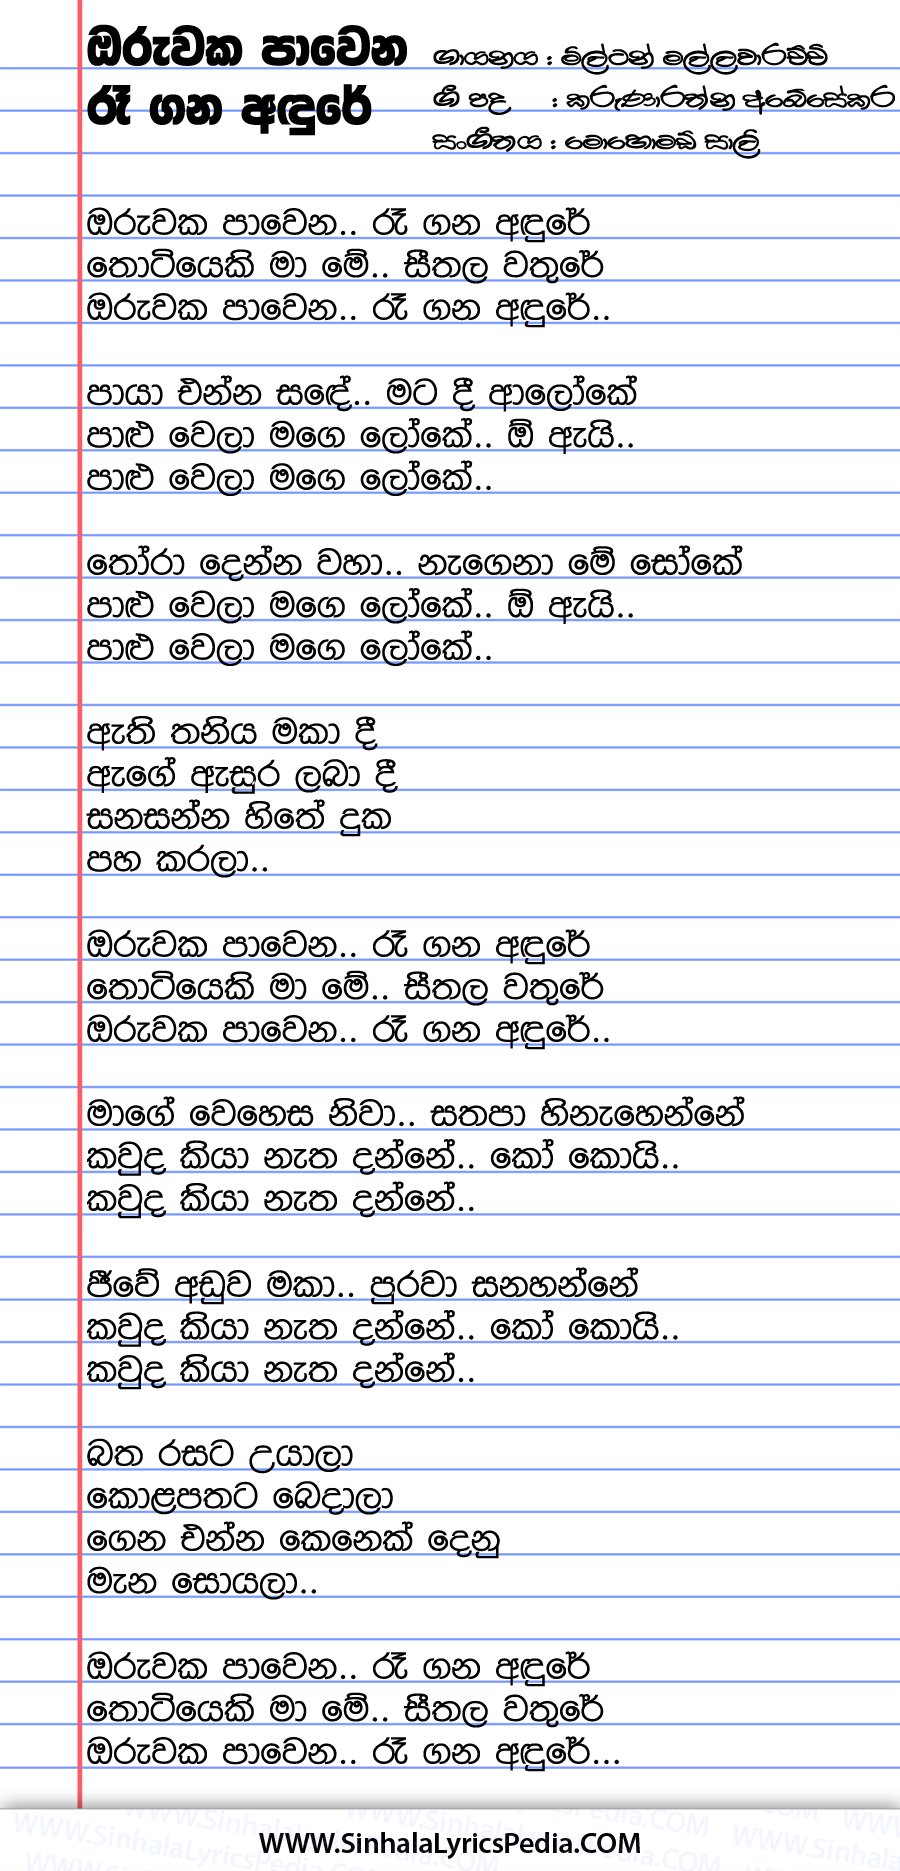 Oruwaka Pawena Ra Gana Andure Song Lyrics